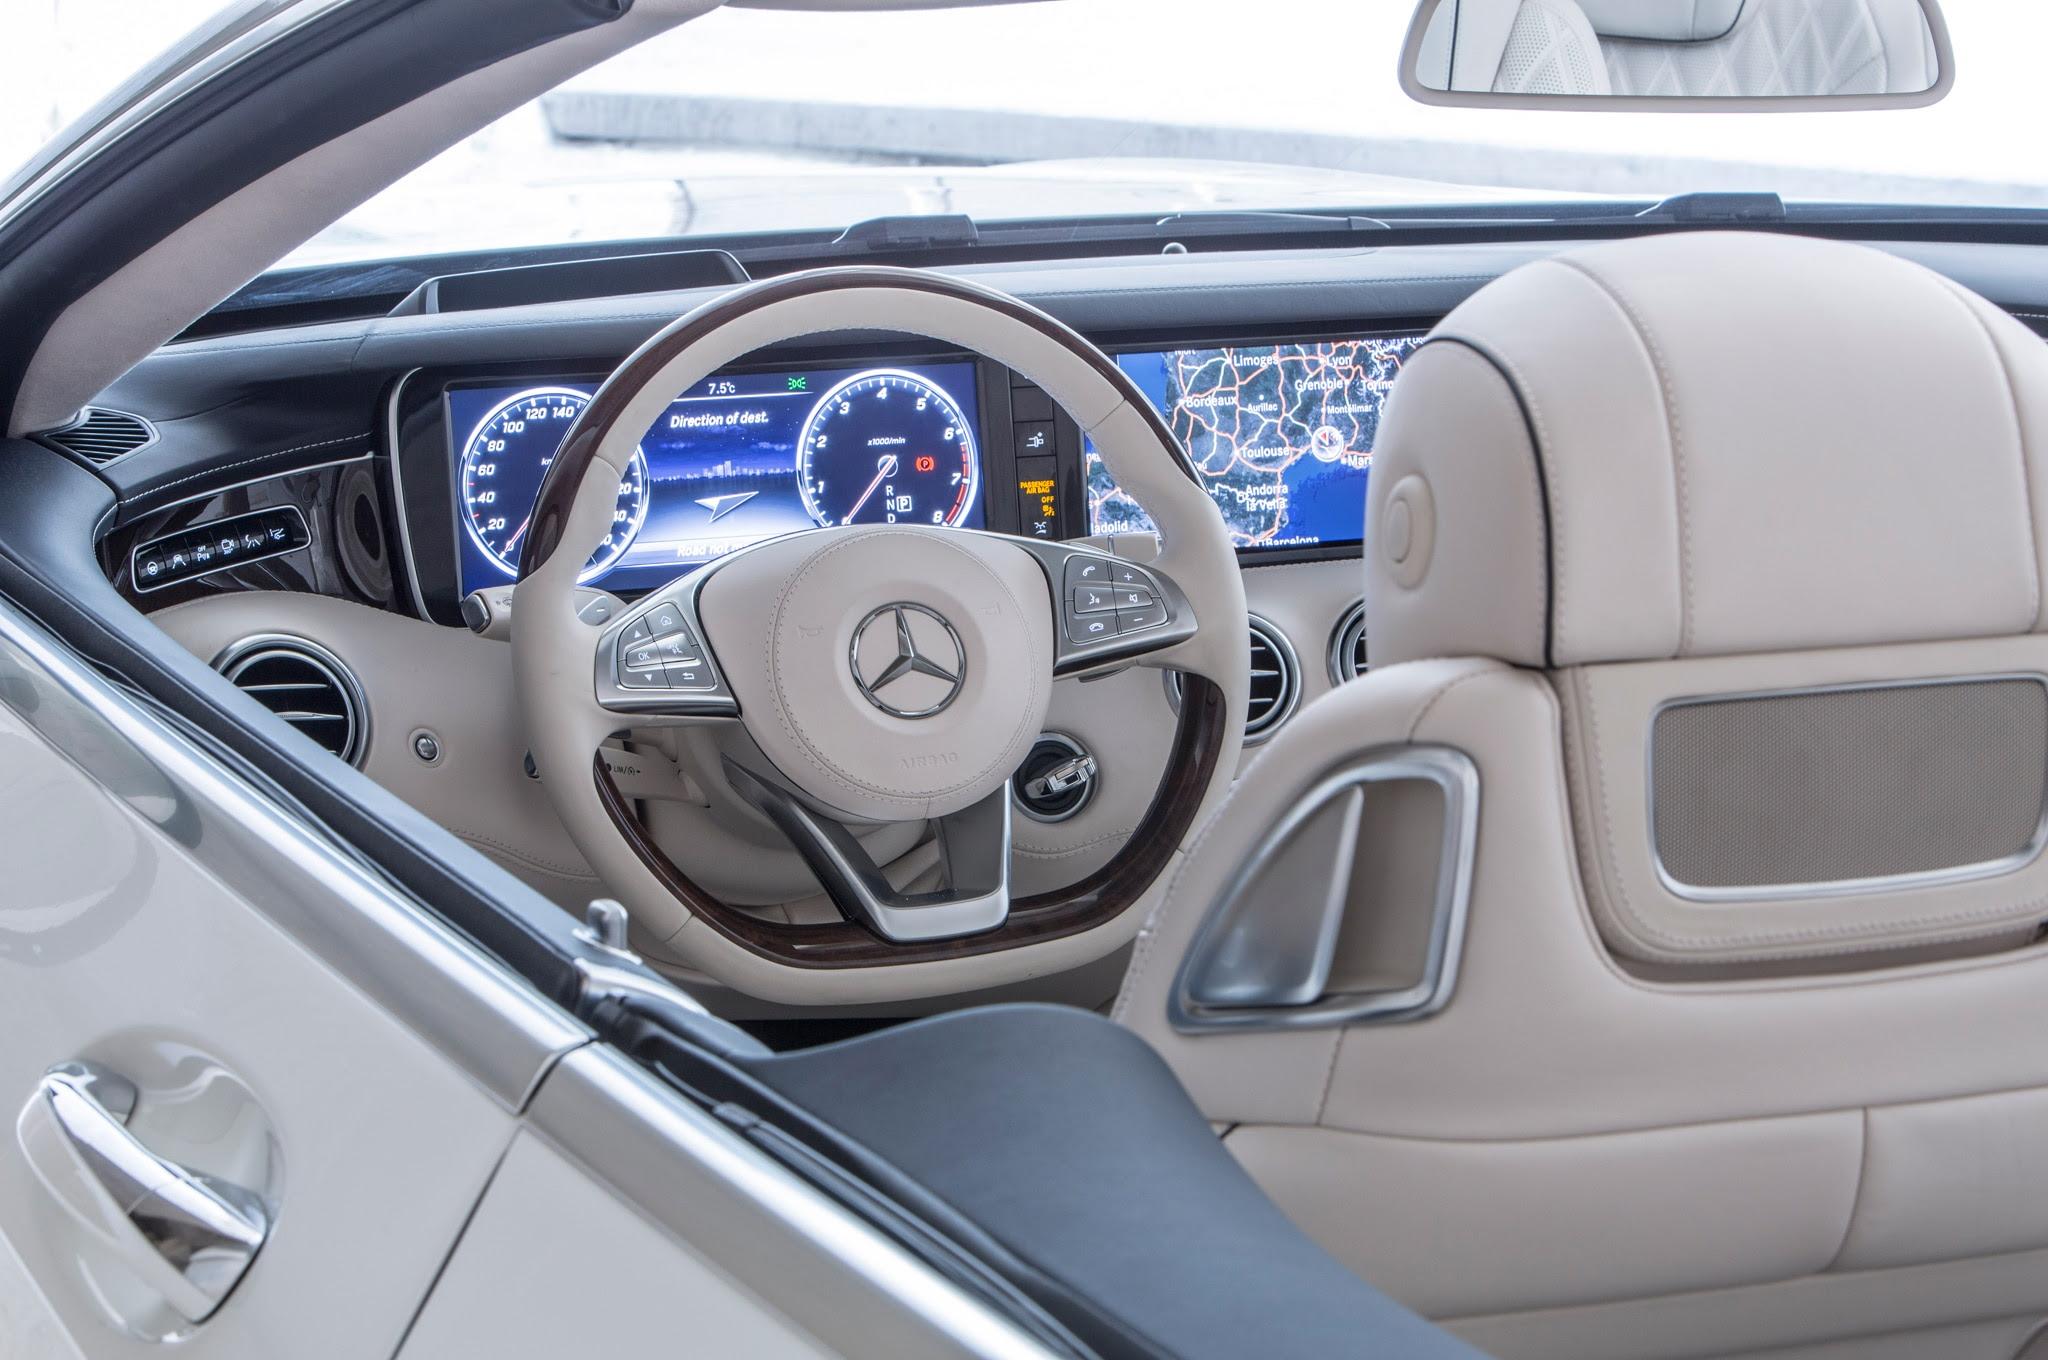 2017 Mercedes-Benz S500 Cabriolet Review